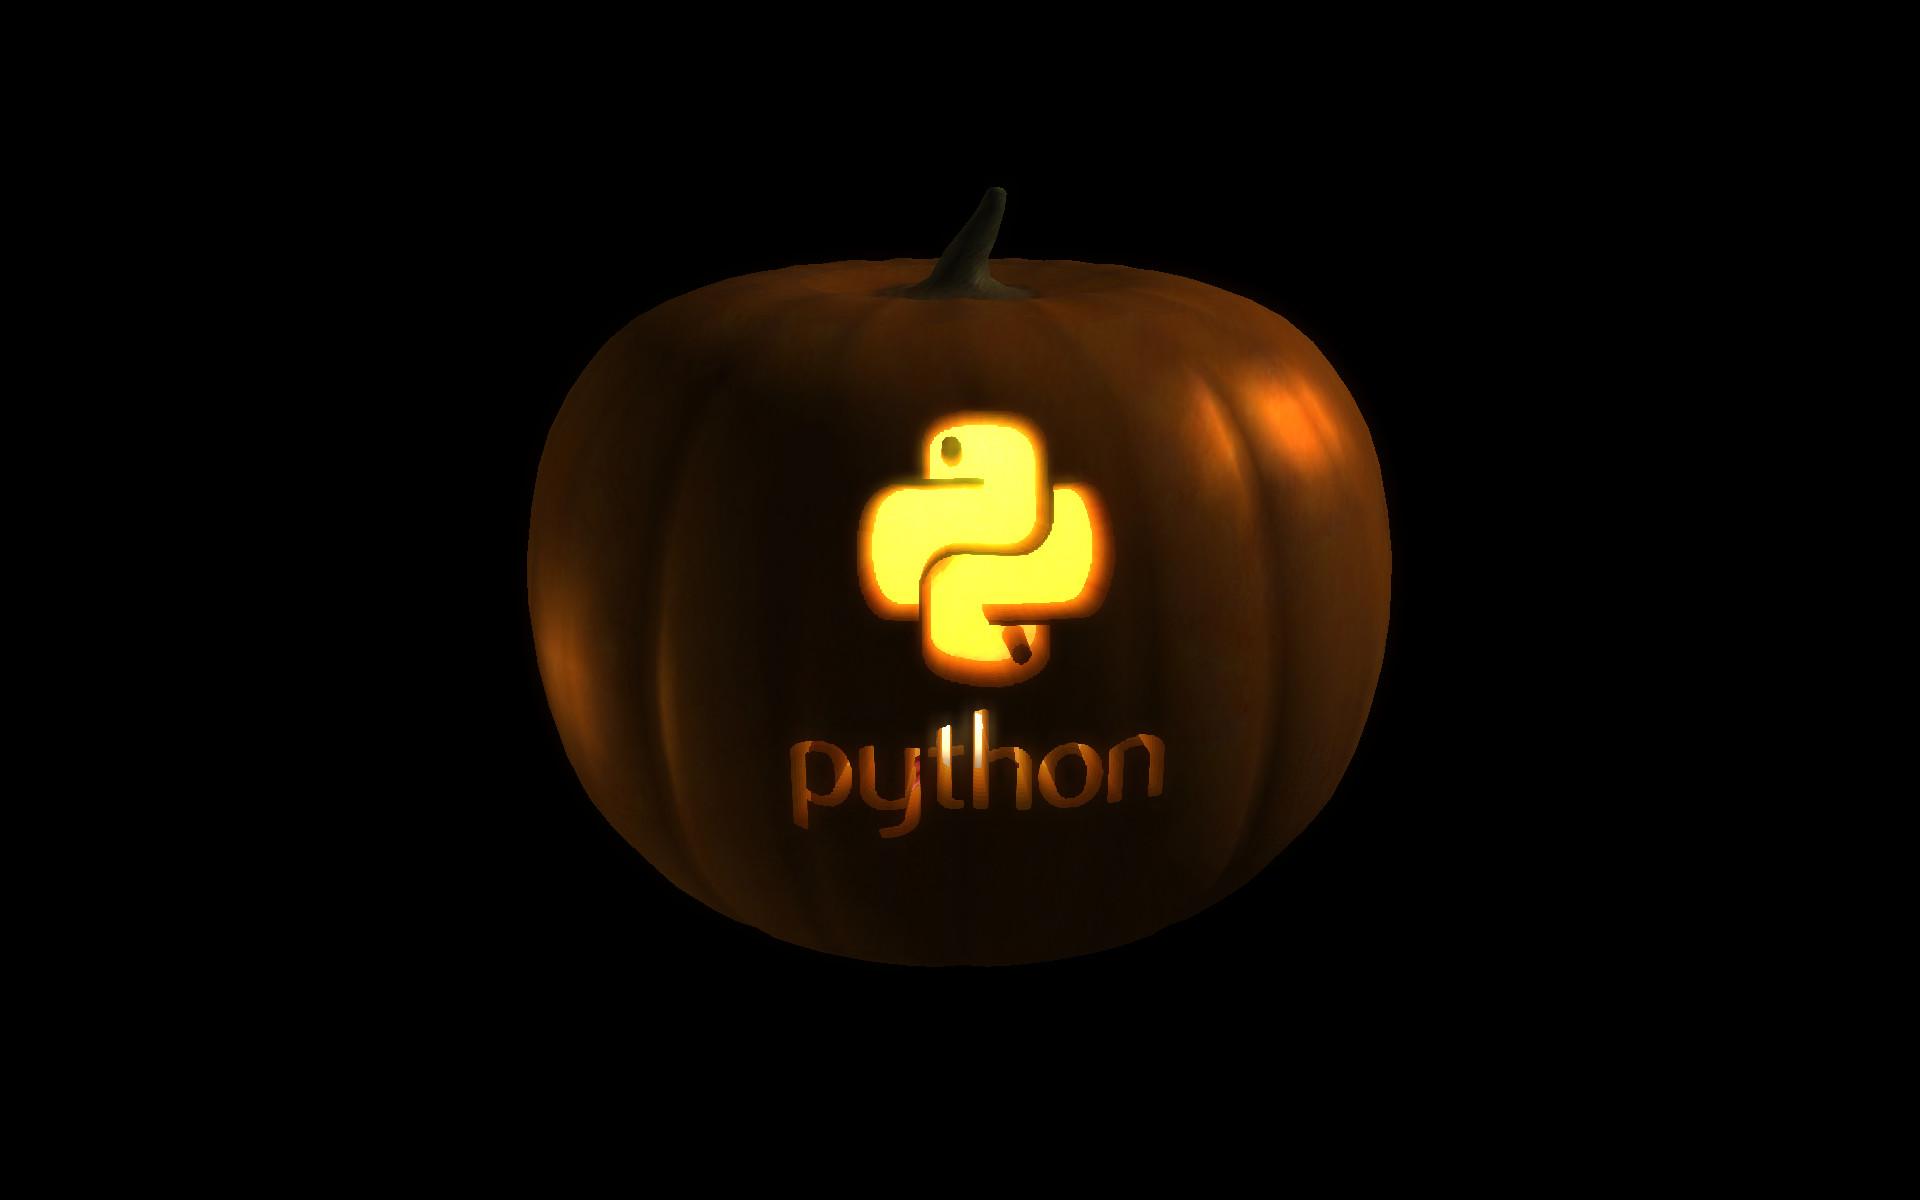 Python programming language wallpaper – photo#16